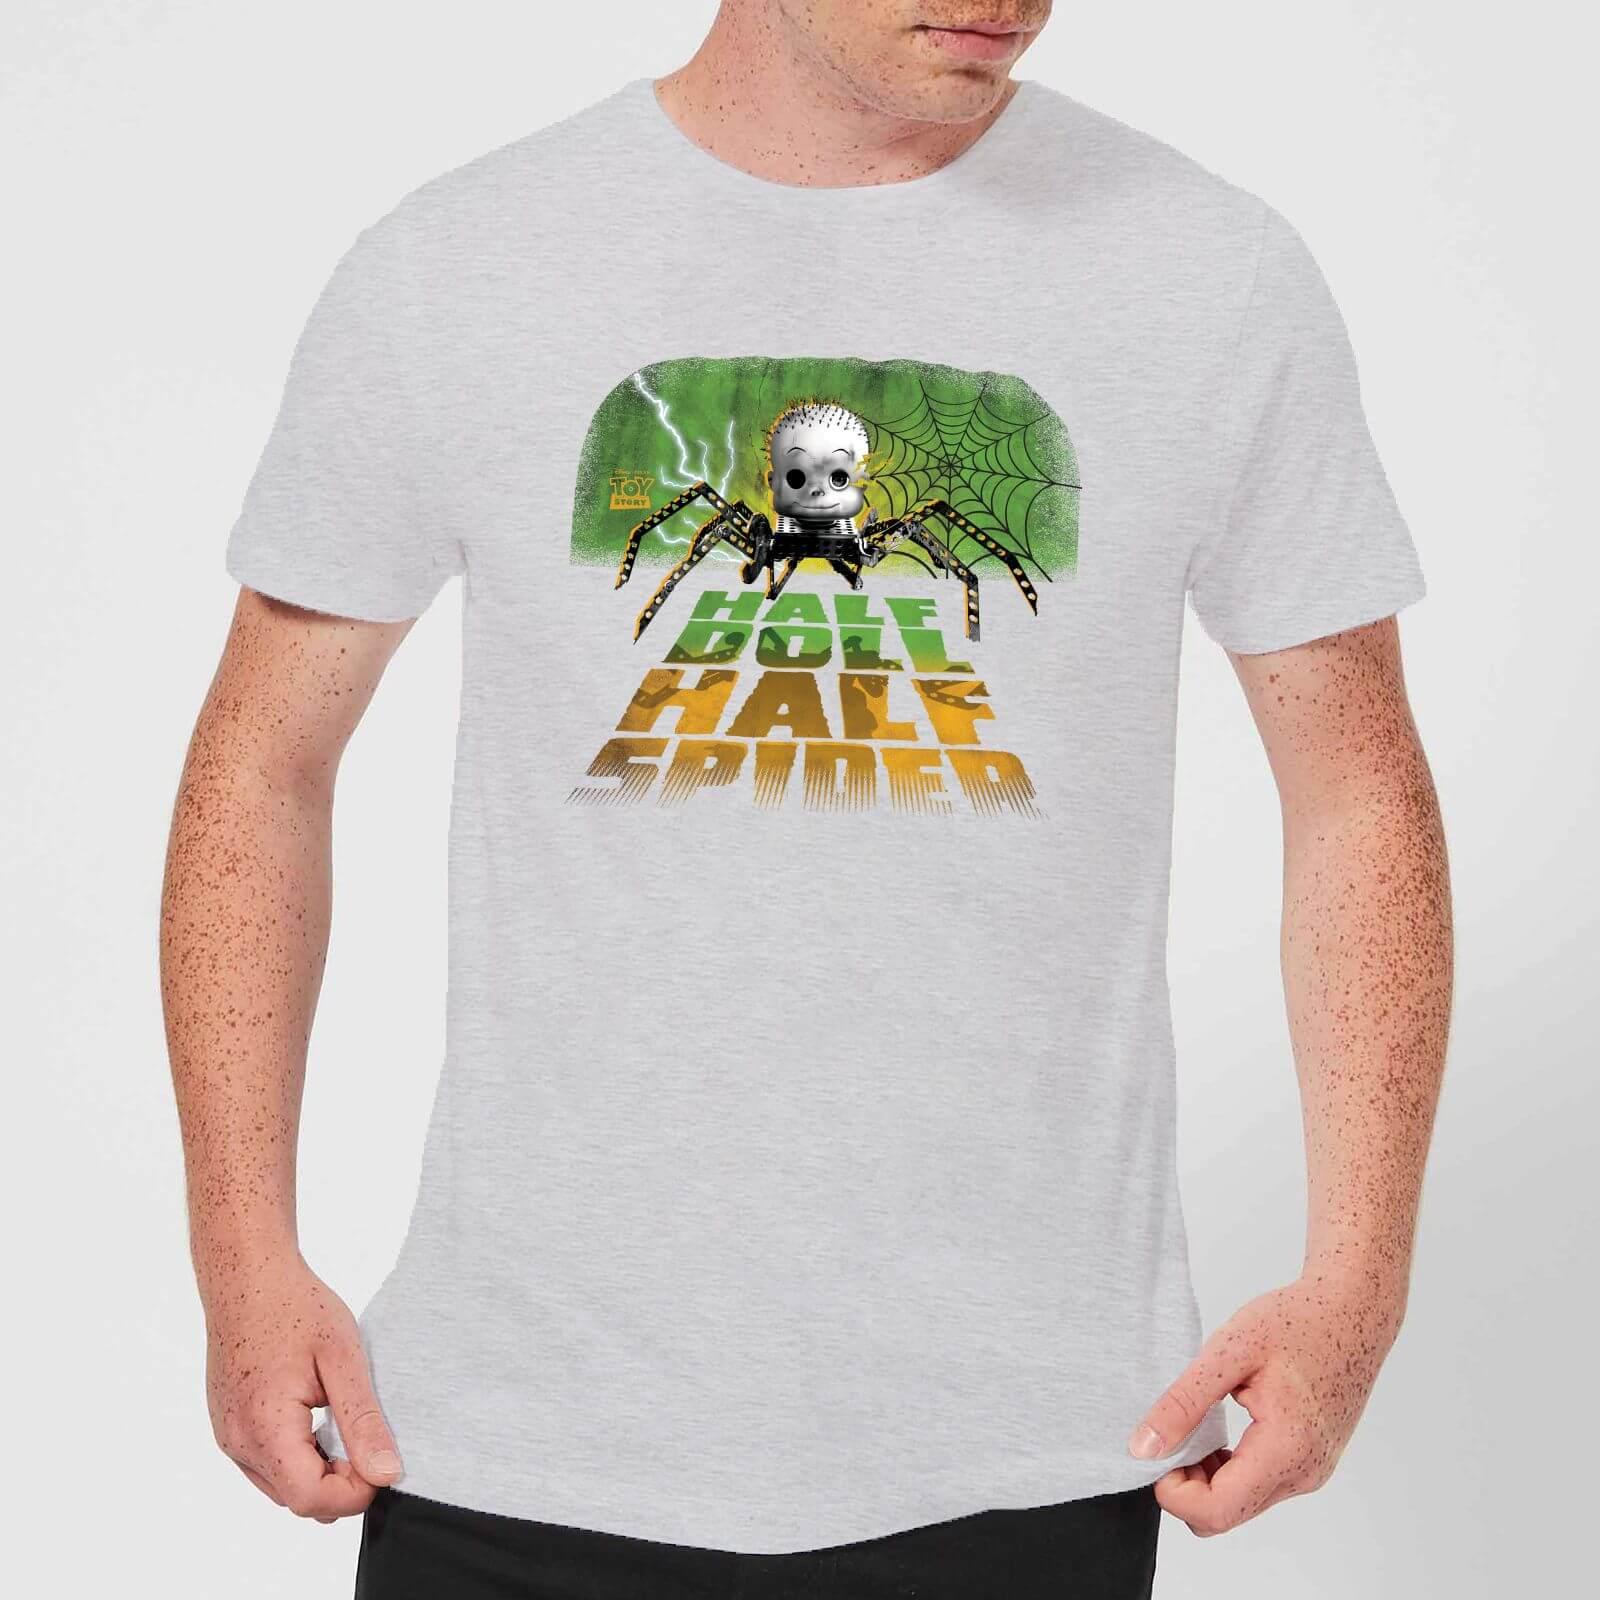 Toy Story Half Doll Half Spider Men's T-Shirt - Grey - XL - Grey